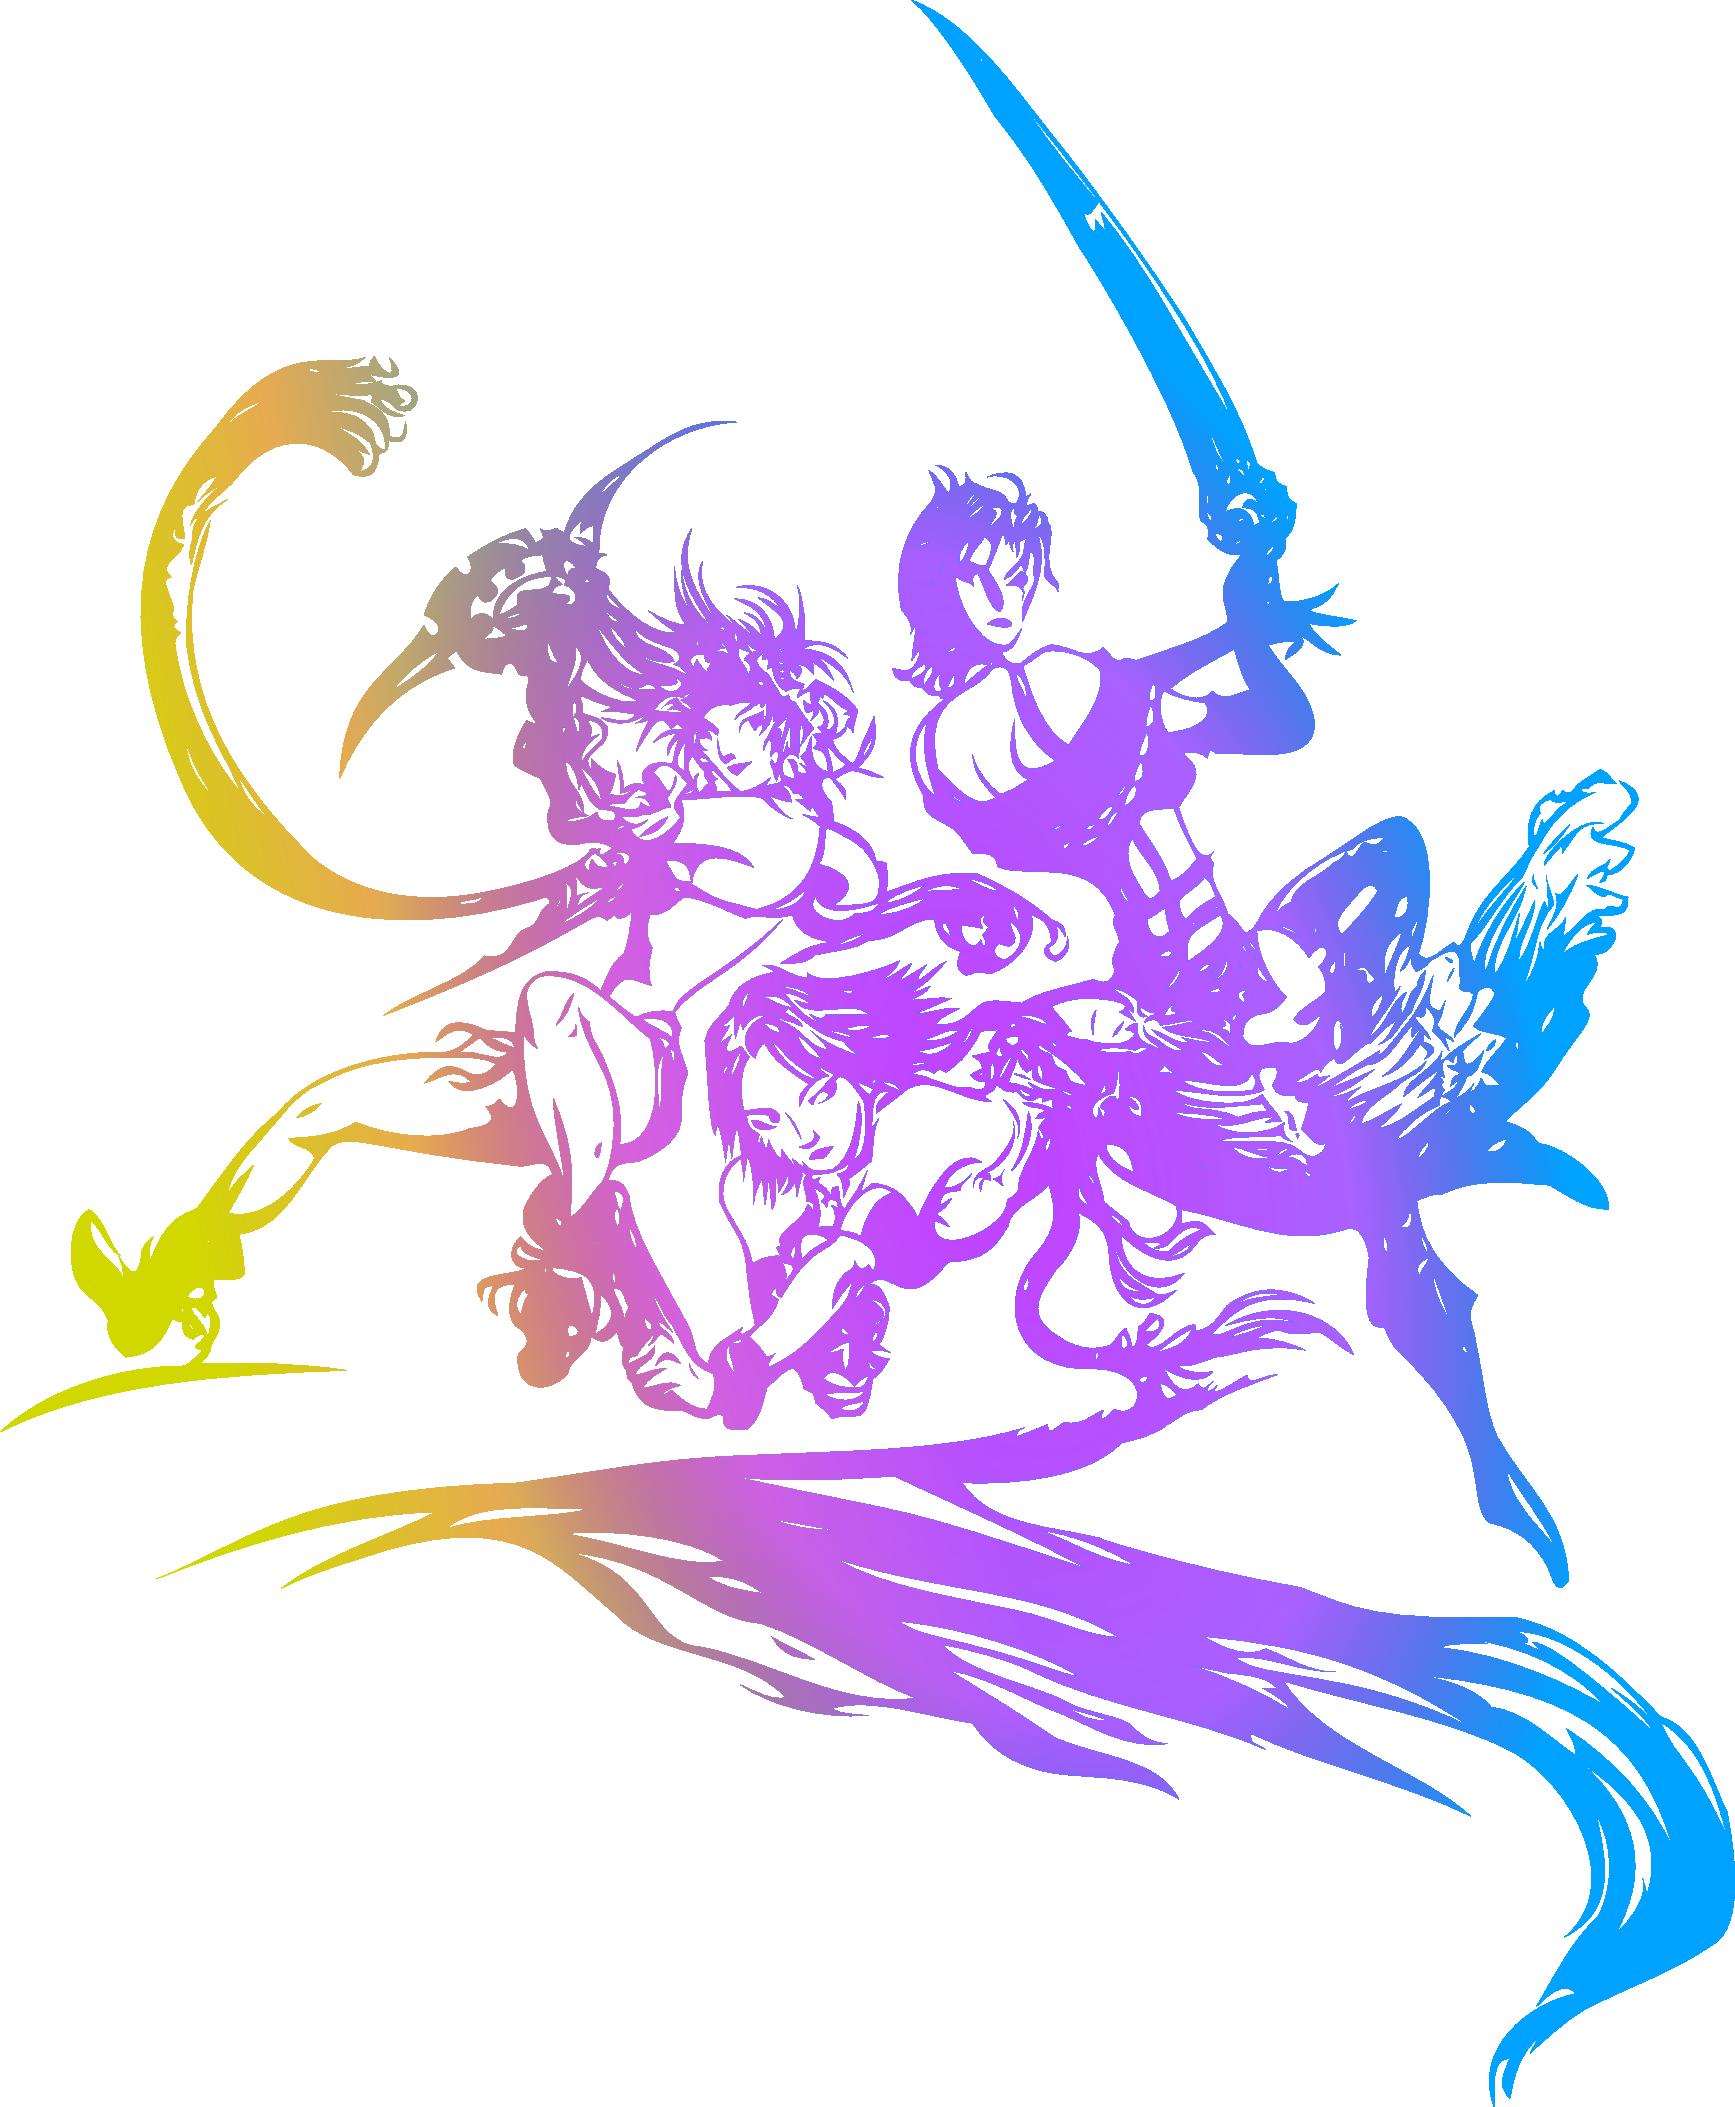 Final Fantasy X2 Final fantasy logo, Final fantasy